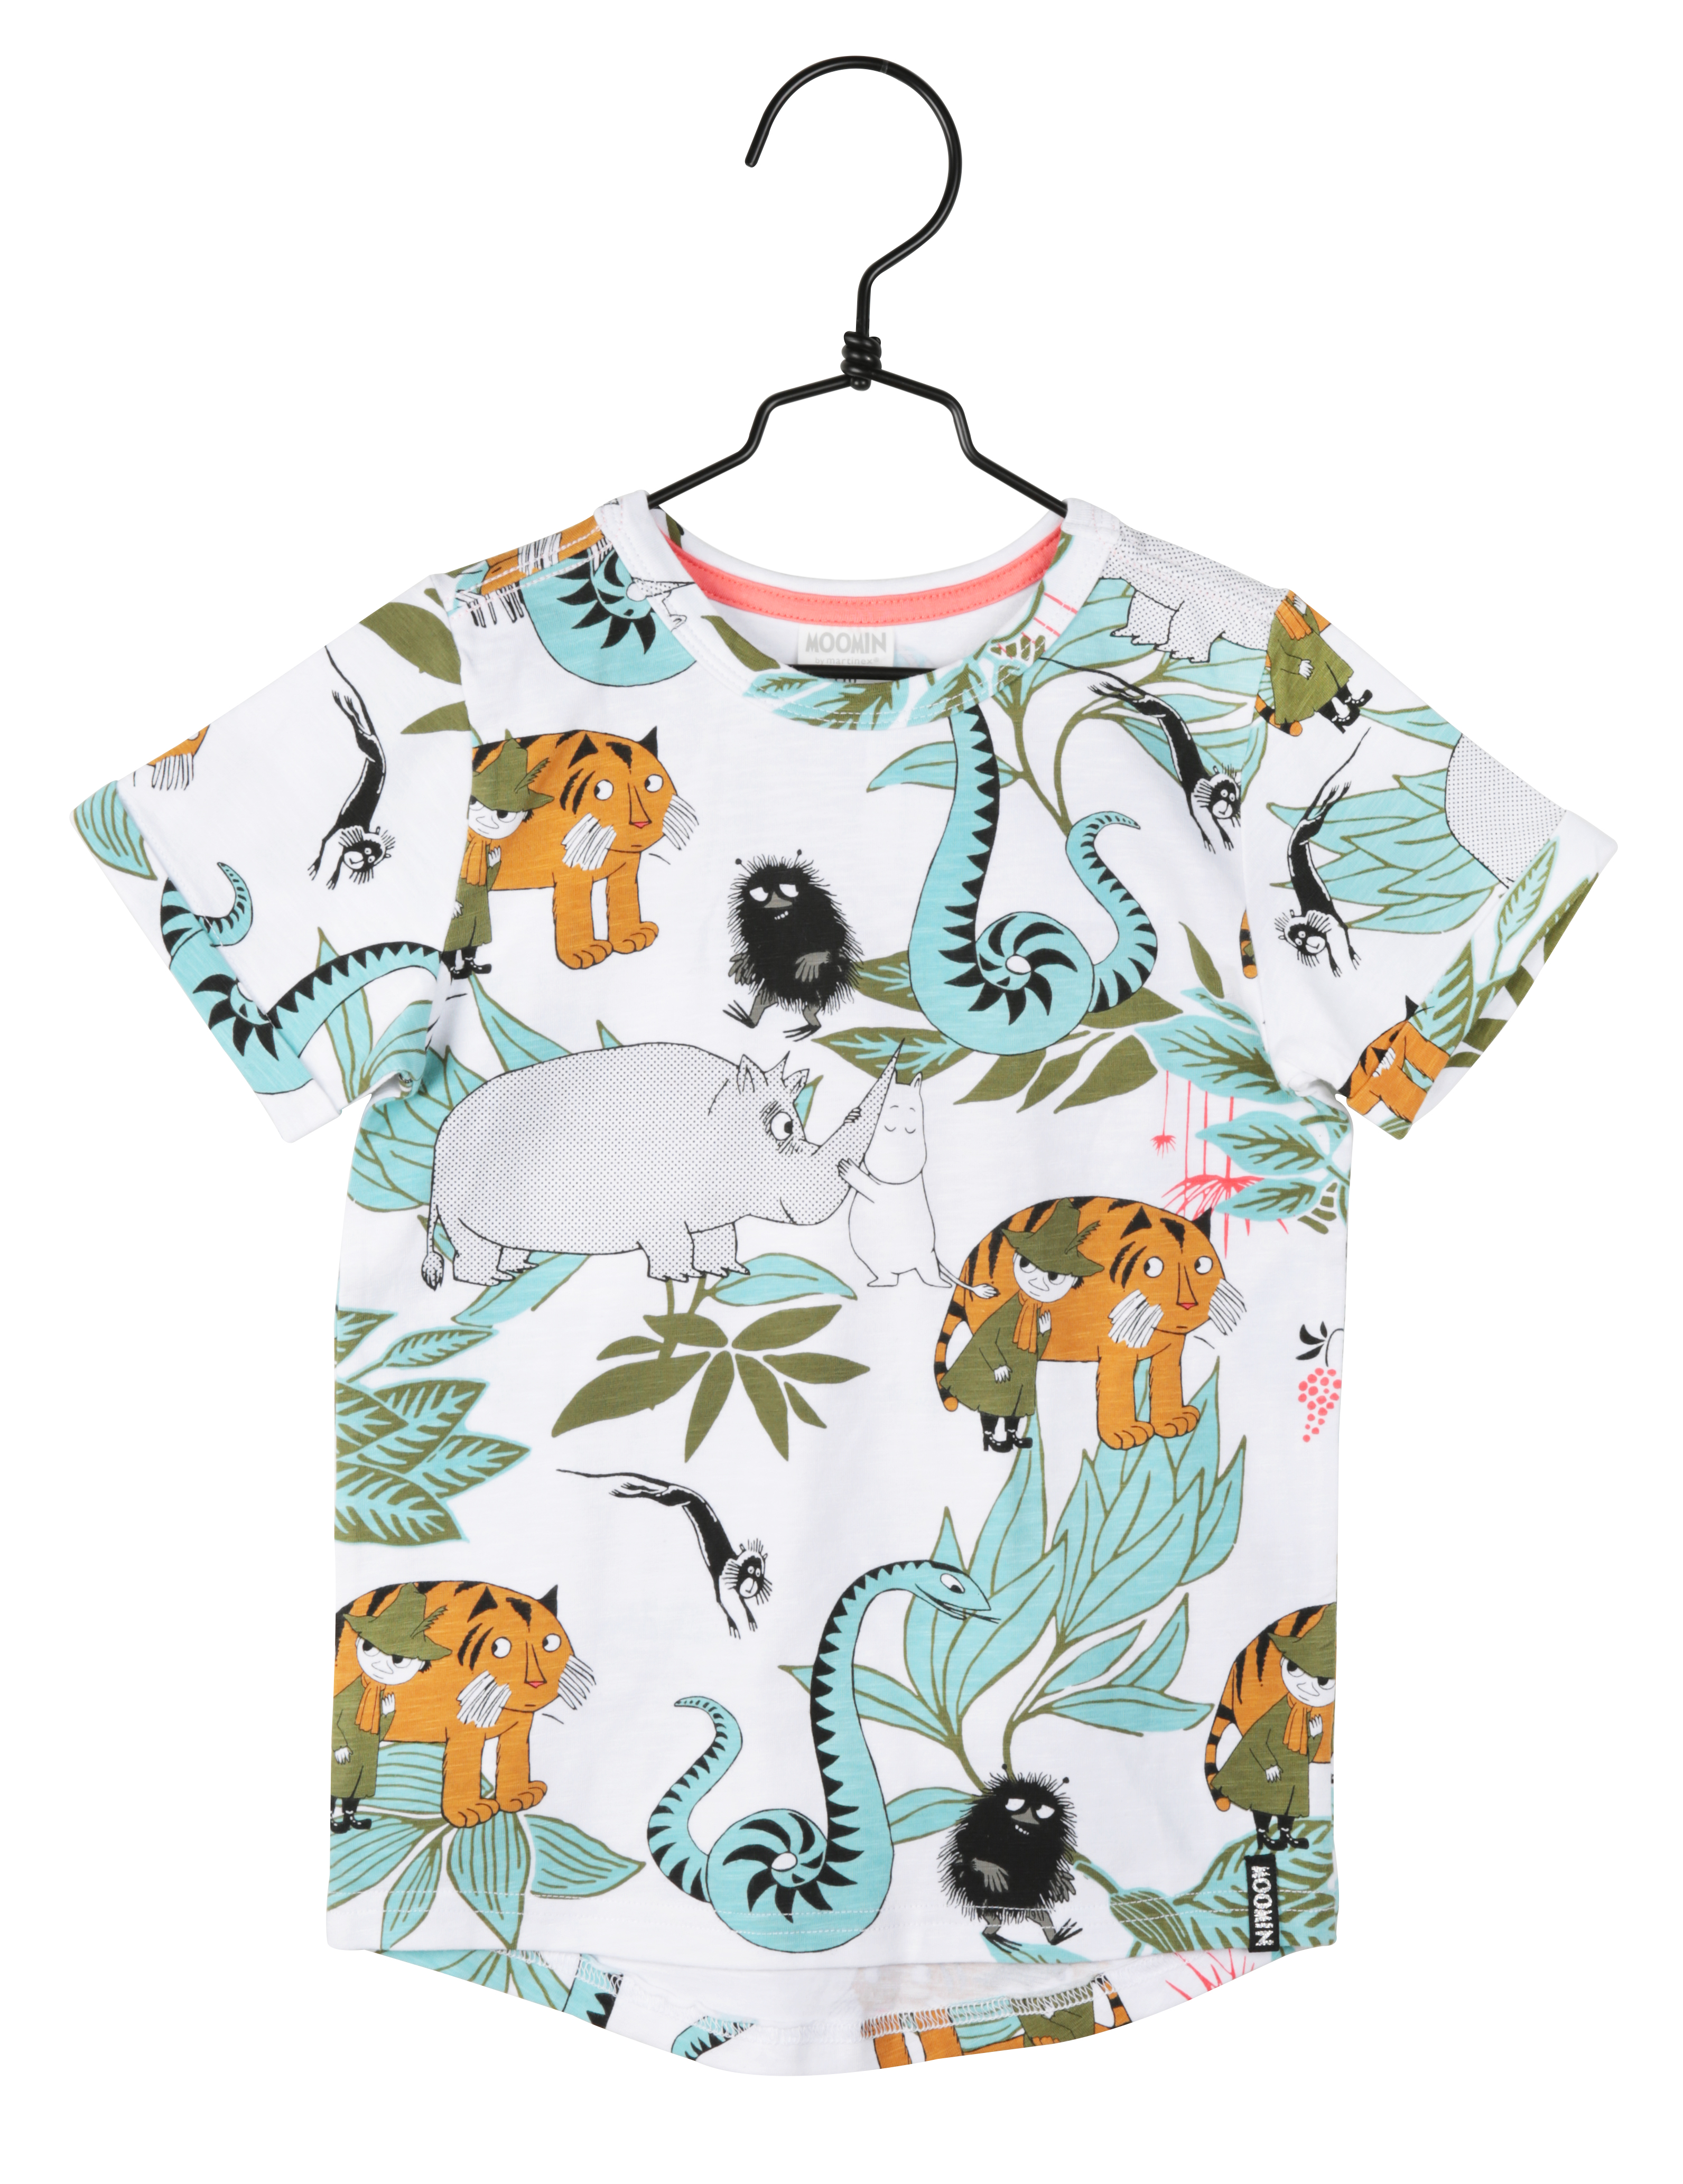 Martinex Moomin Jungle T-shirt